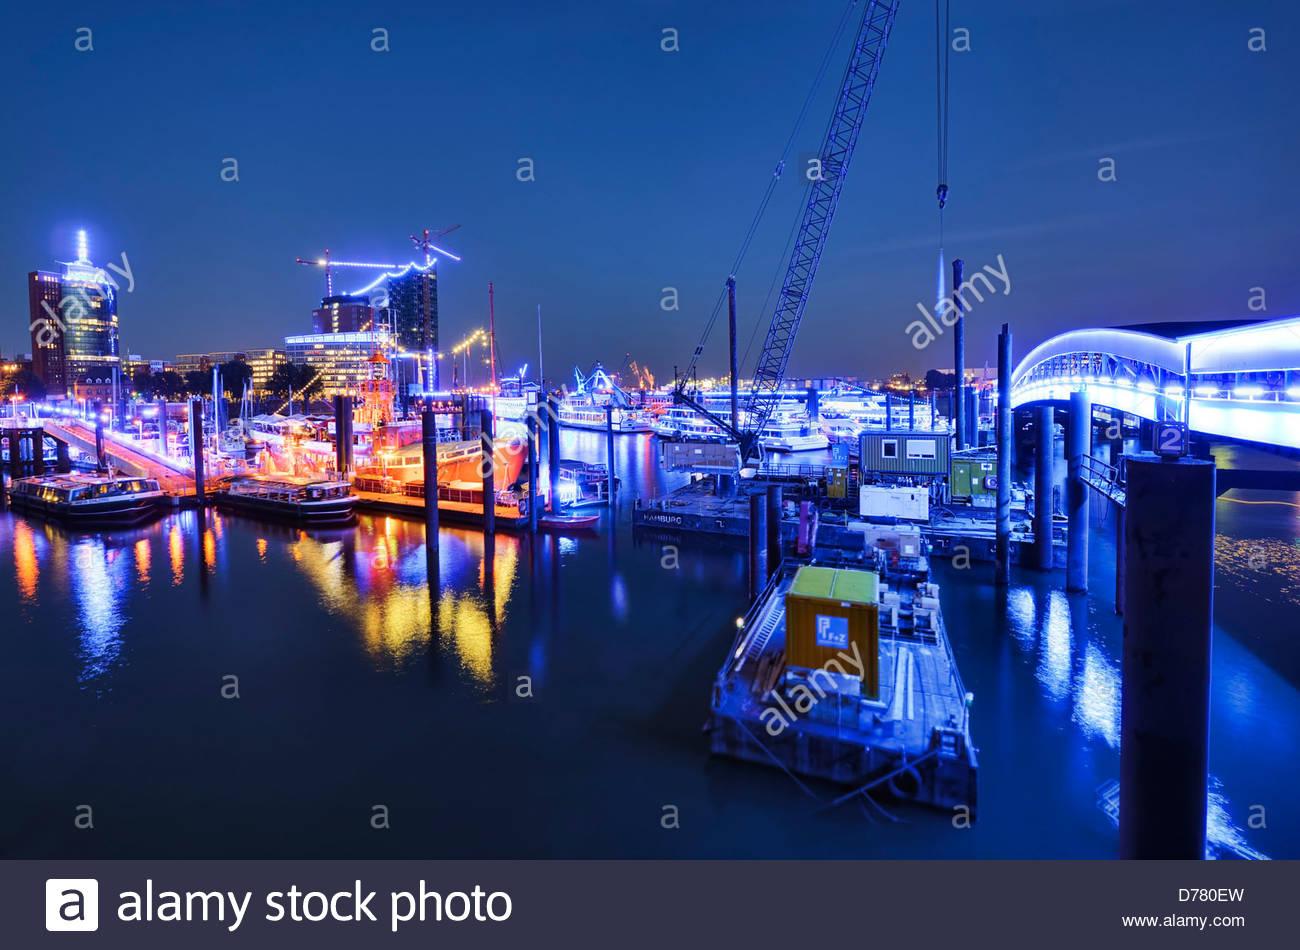 Illumination Blue port of Michael Batz, city-sports harbour with lightship and Elbphilharmonie in Hamburg, Germany, - Stock Image